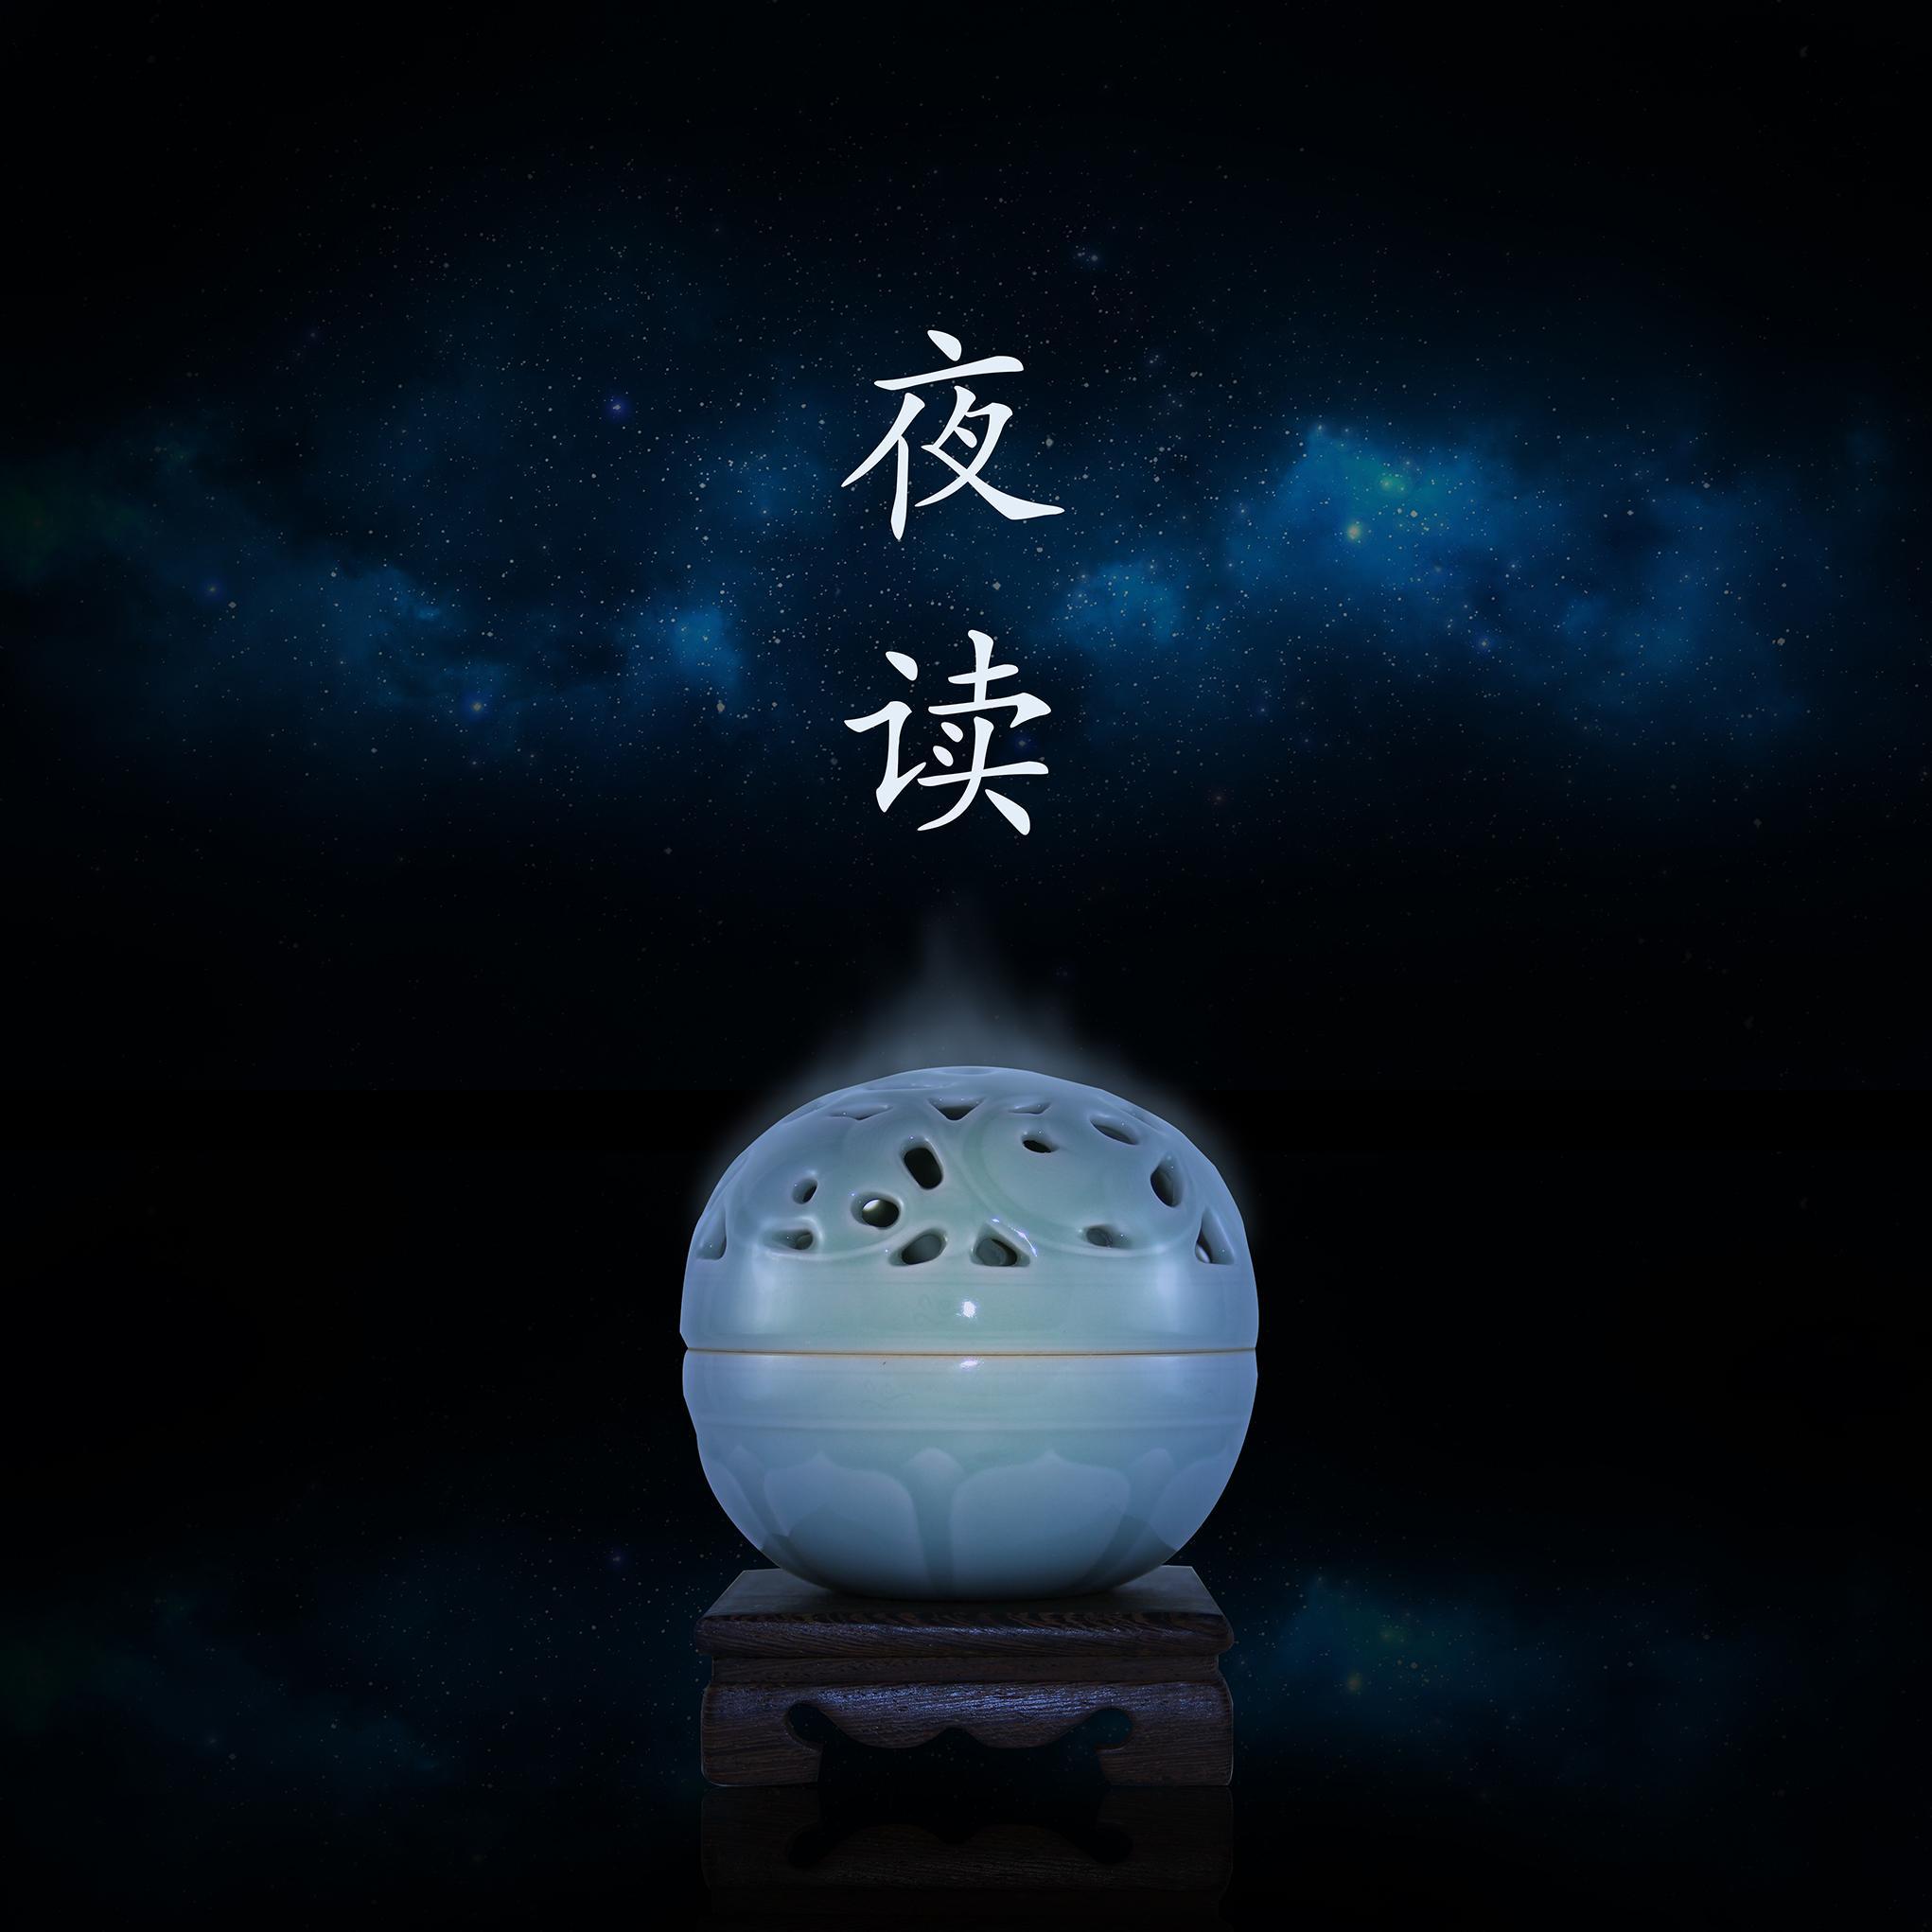 <![CDATA[夜读·中华遗产]]>